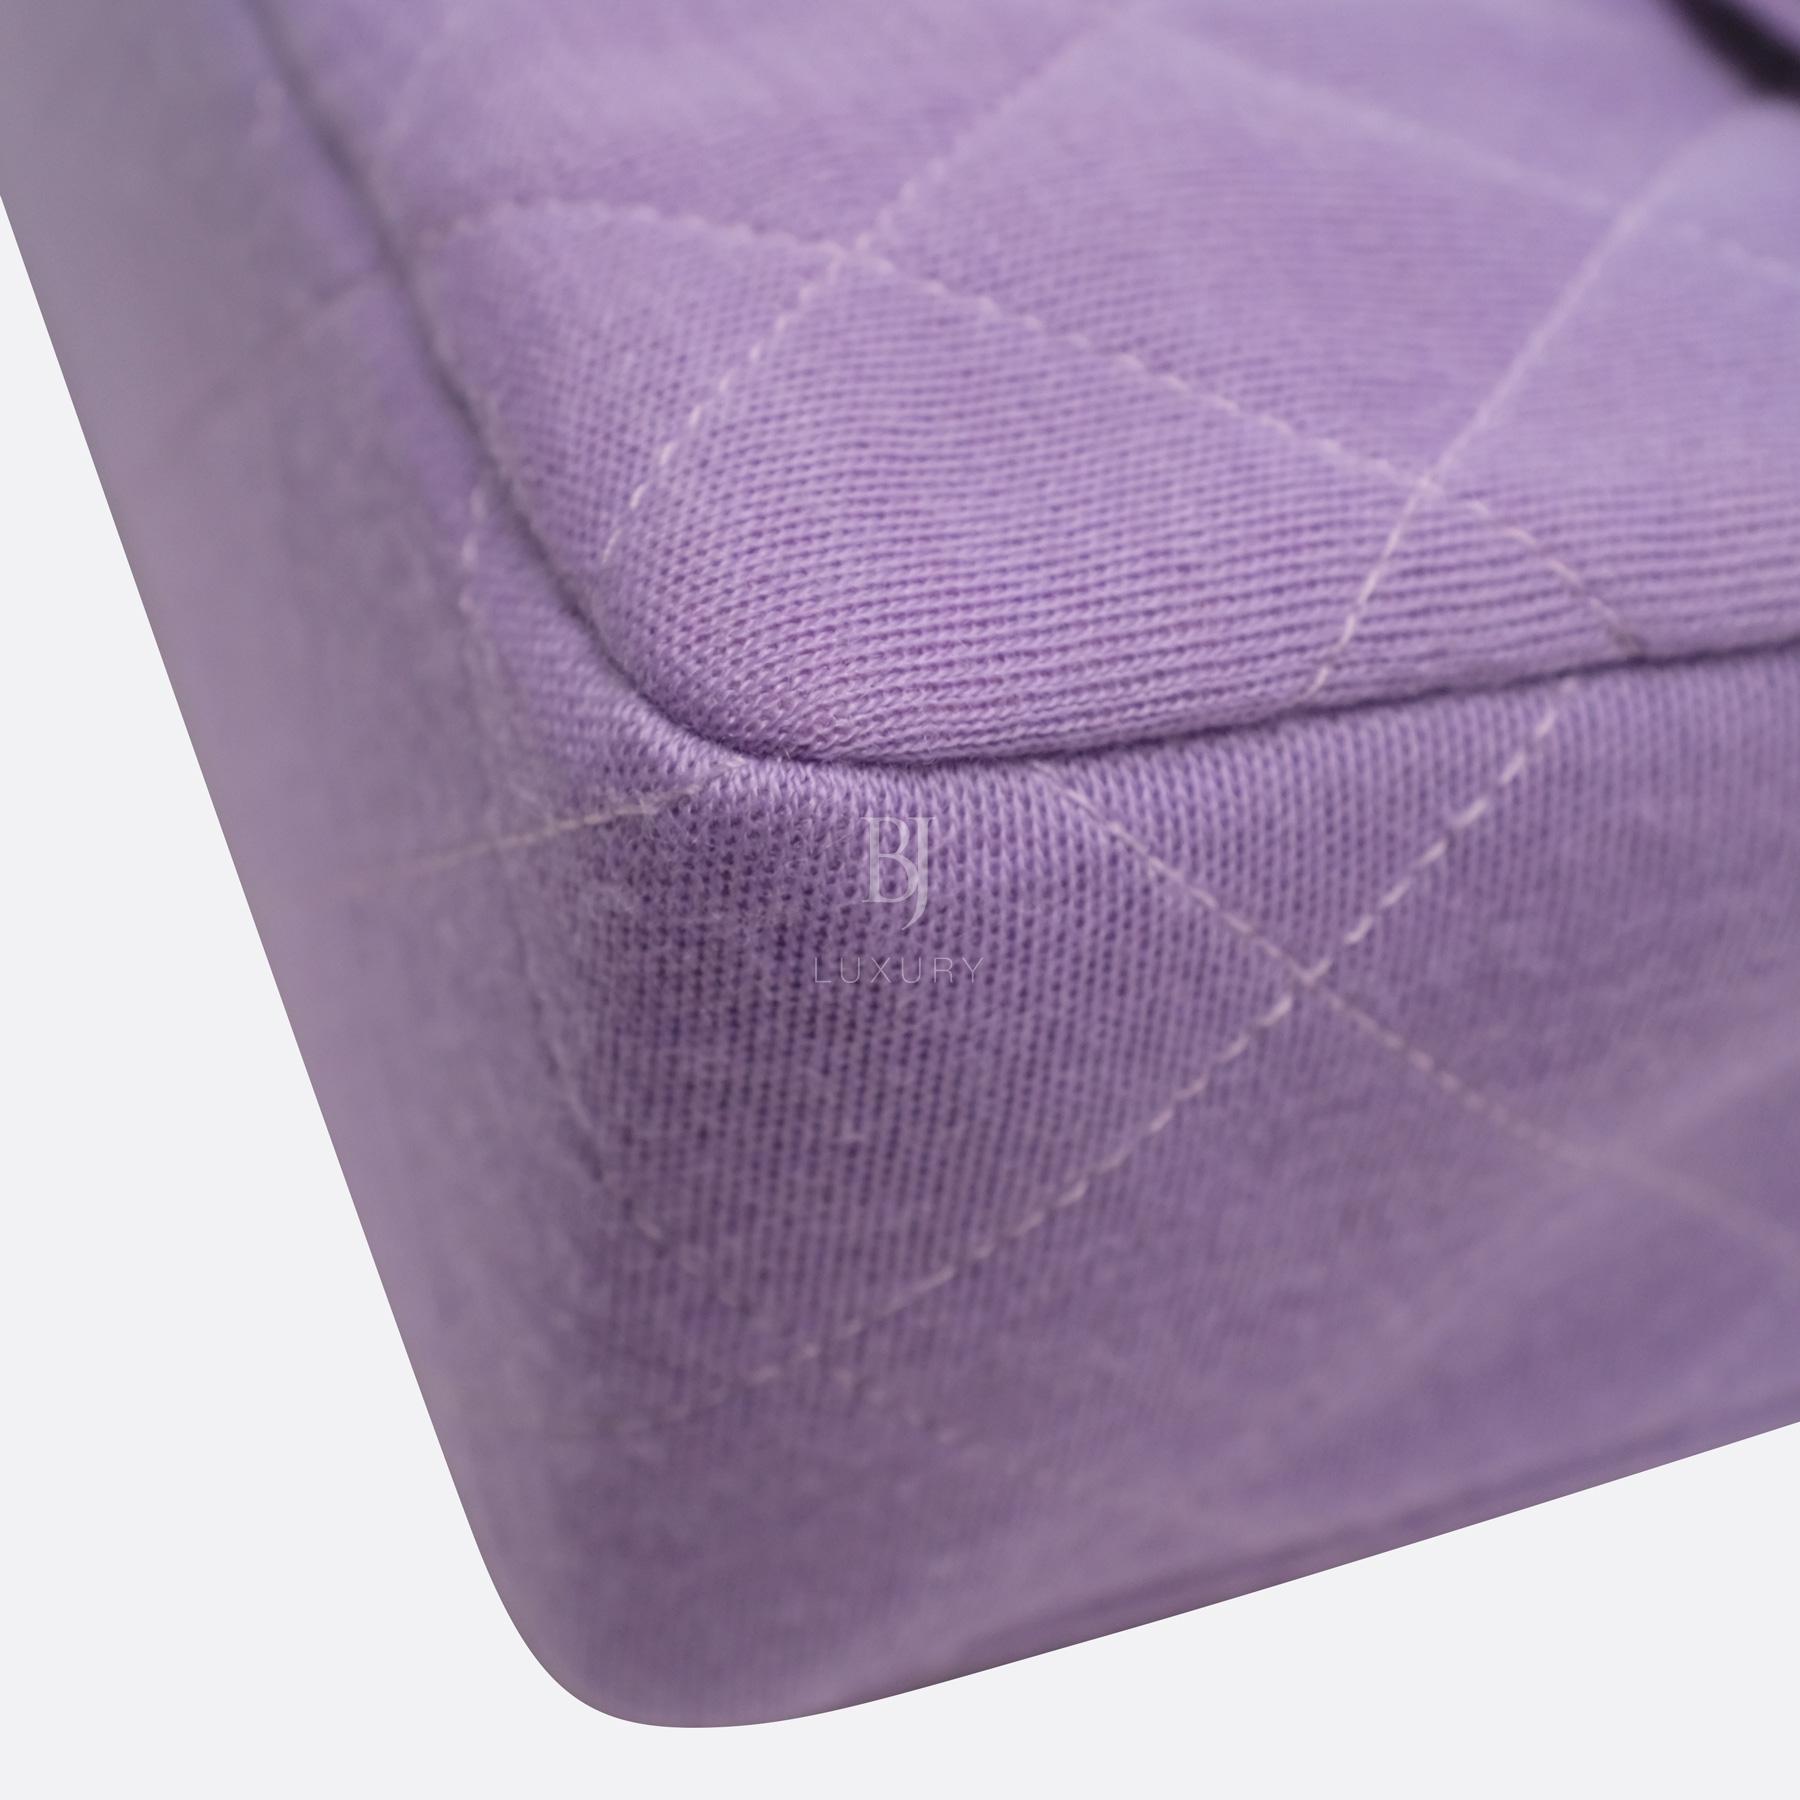 Chanel Flap Bag Medium Jersey Gold Lilac BJ Luxury 9.jpg